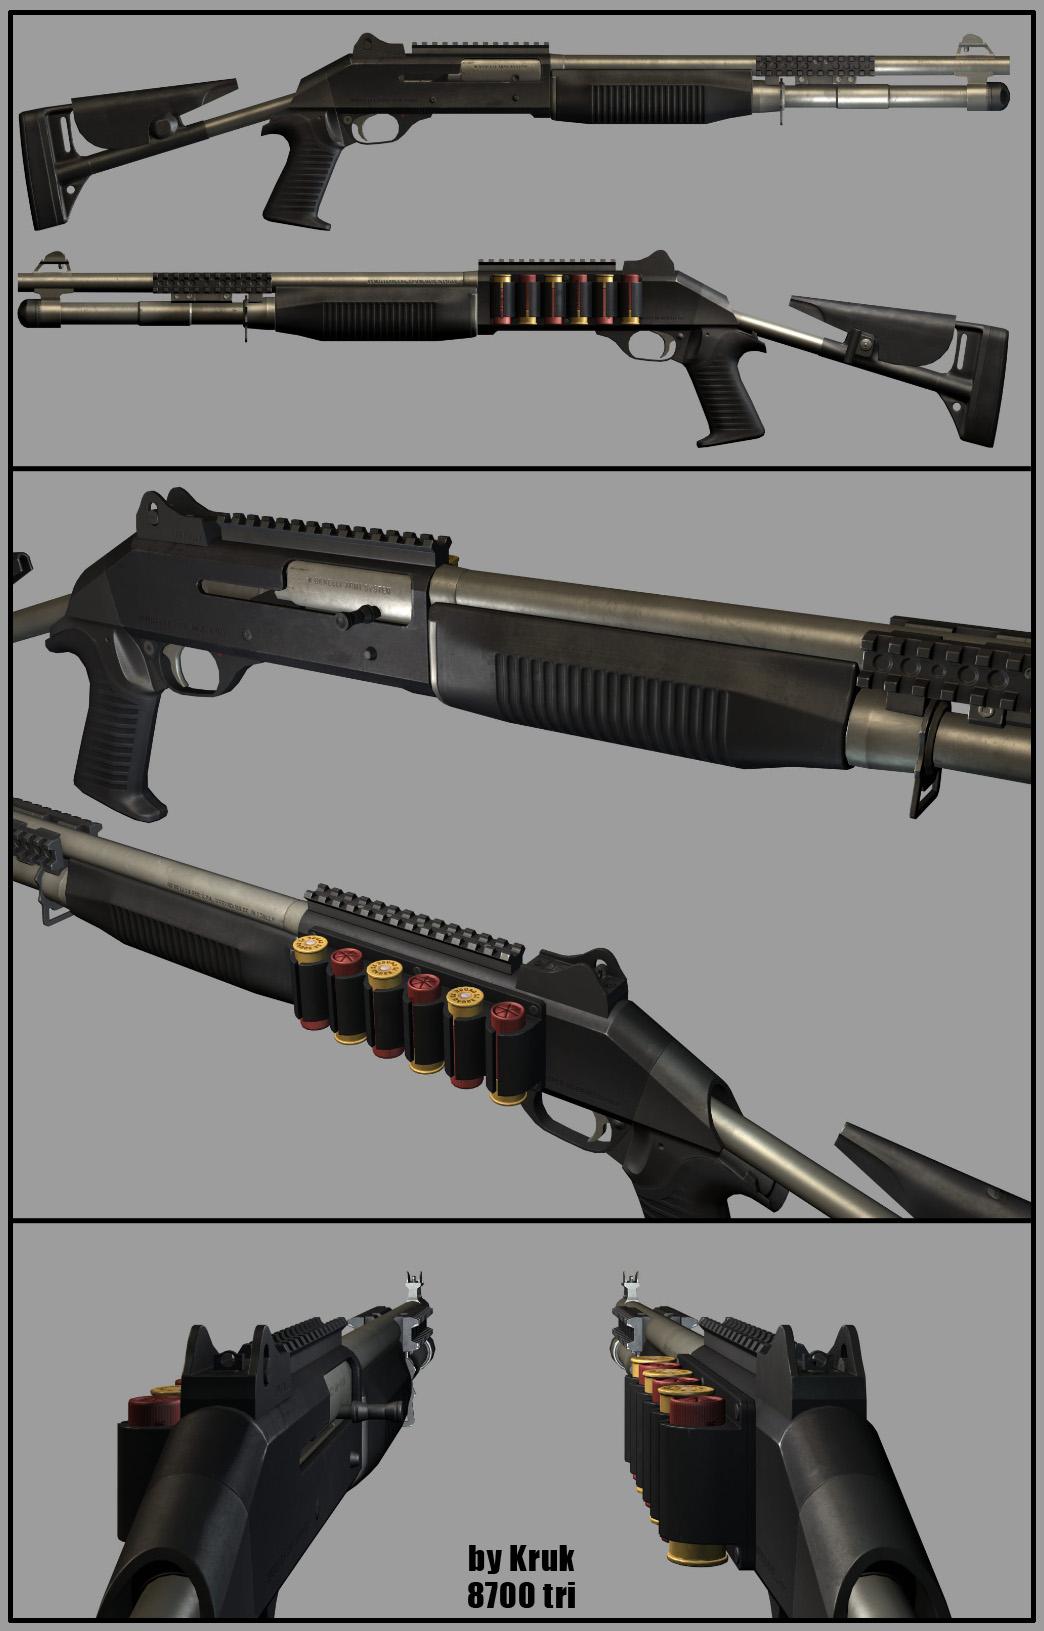 Weapon 3D: Shotgun benelli m4 by Kruku